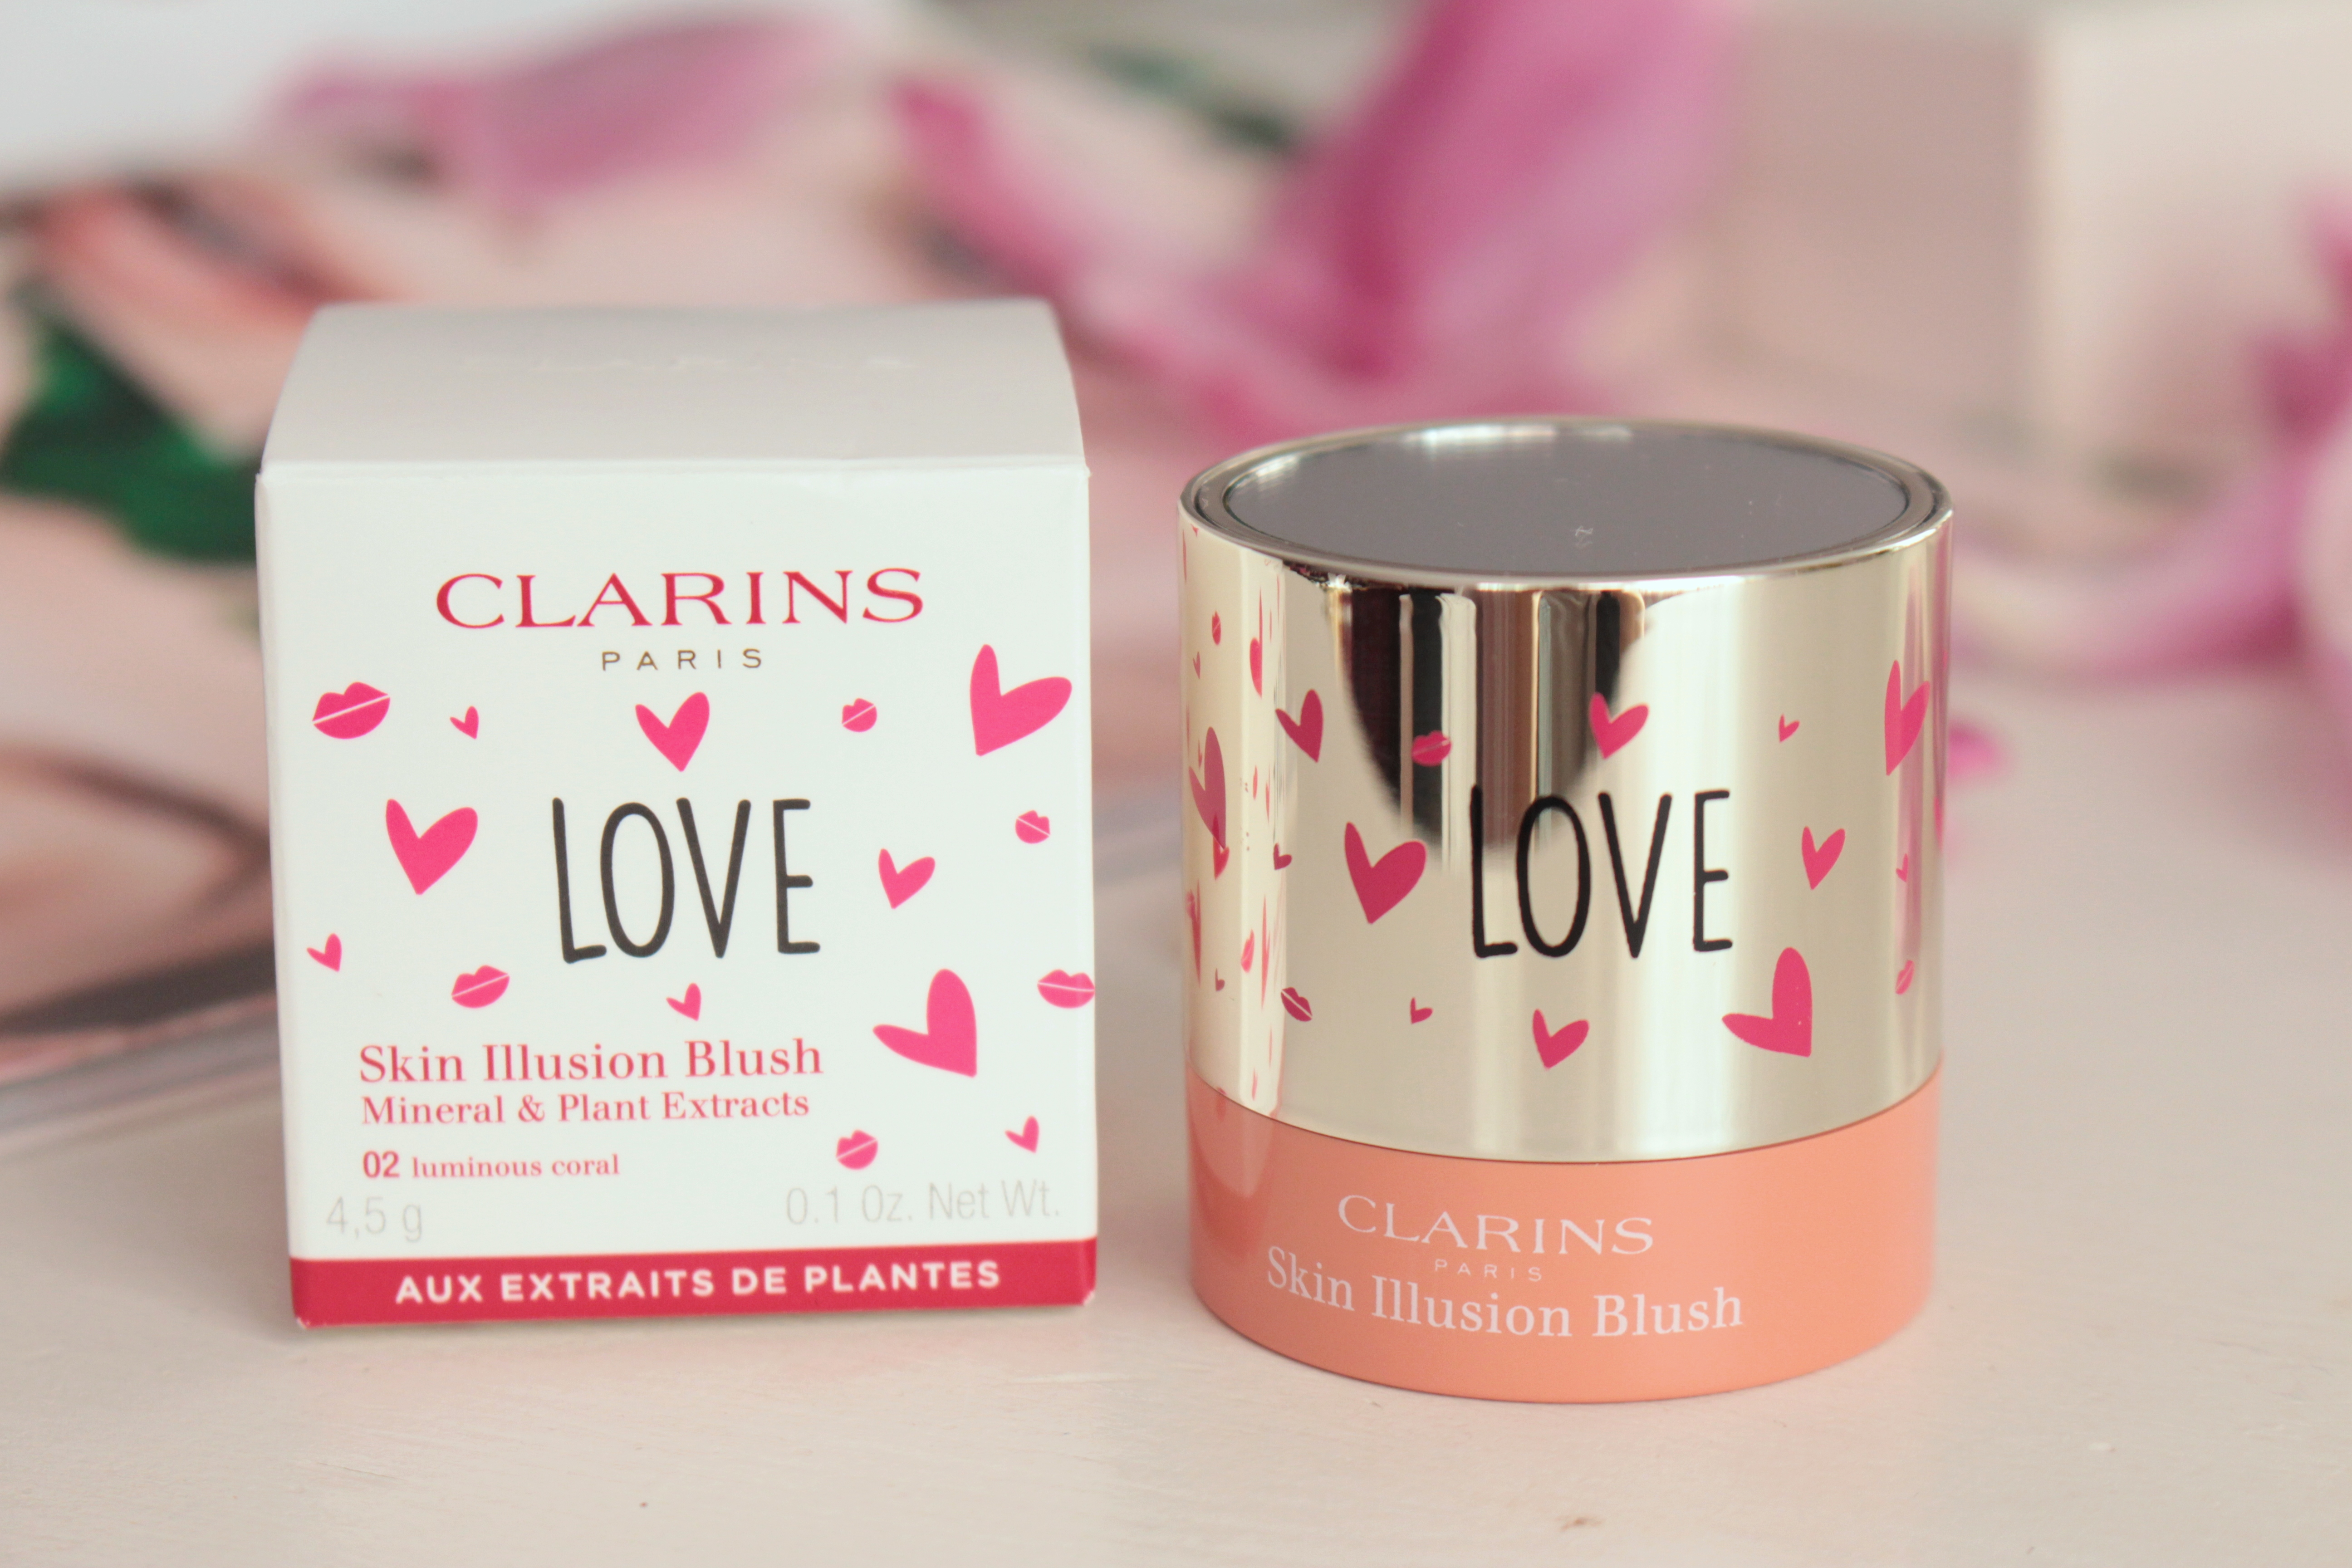 Clarins Tender Moments Skin Illusion Blush «02 Luminous Coral» Компактные румяна